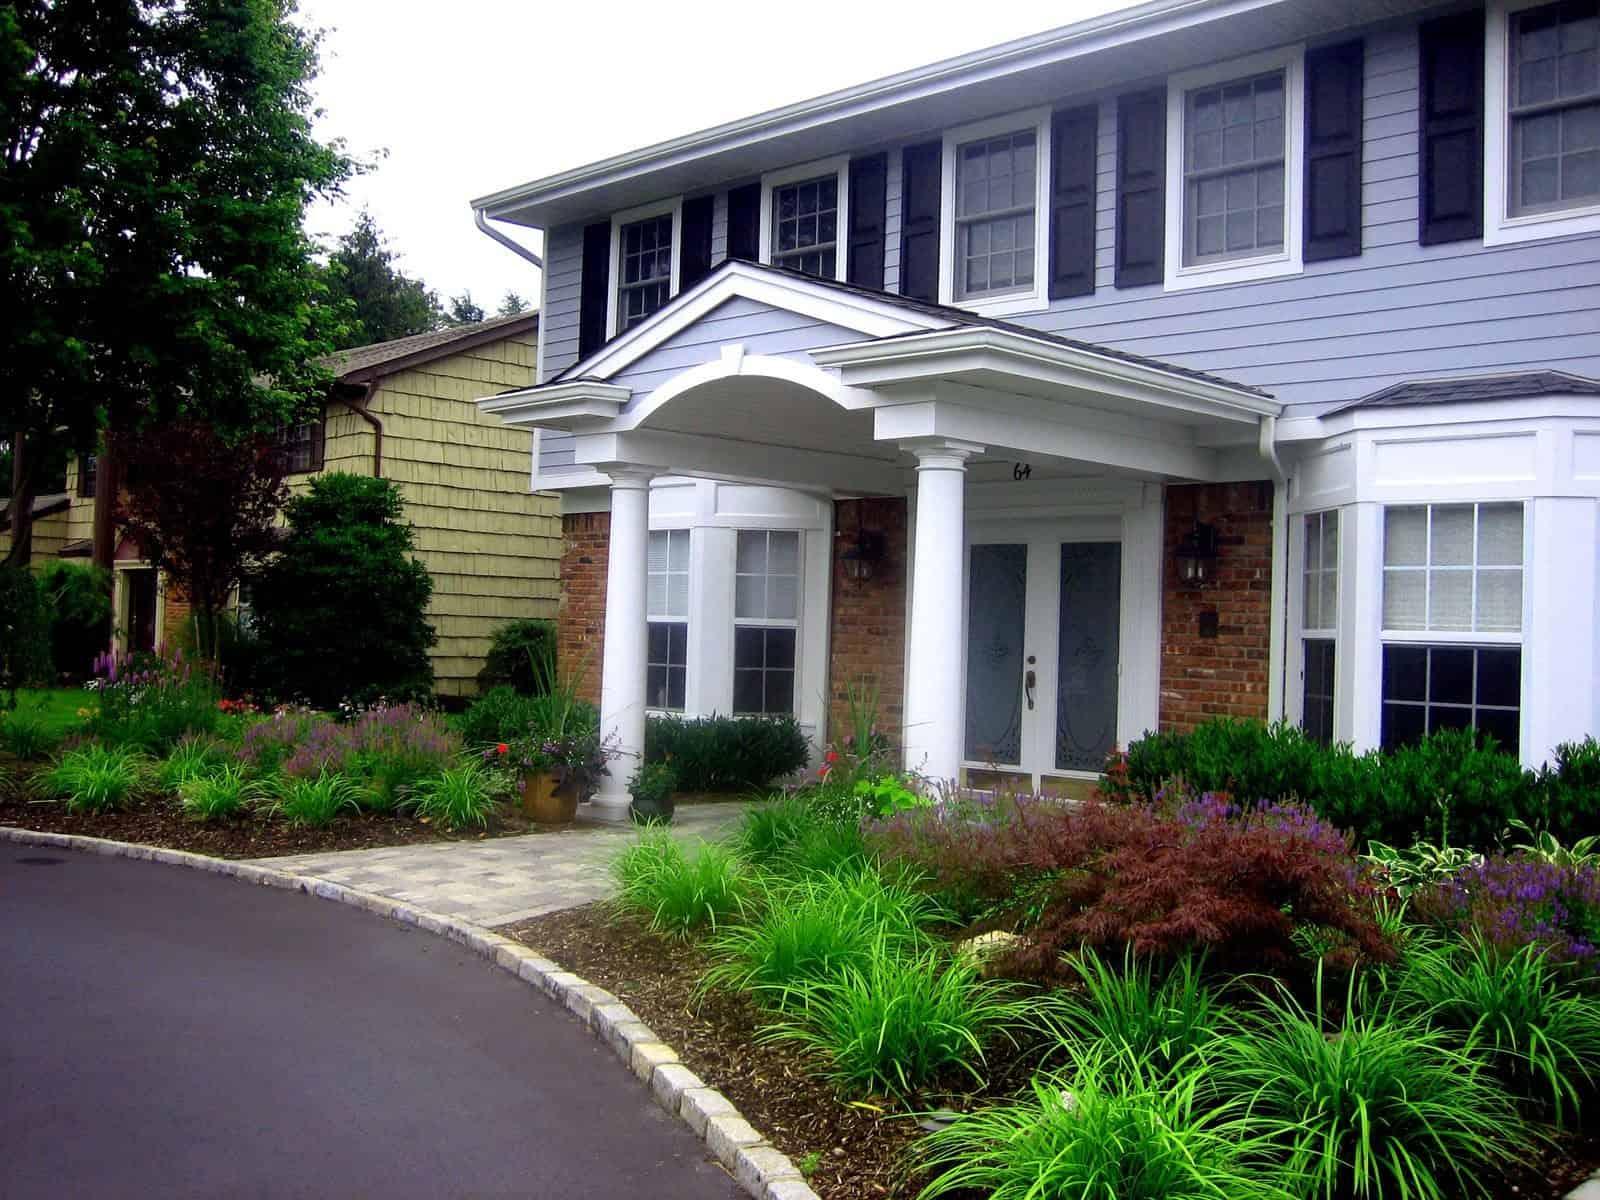 Landscape Plantings - Liriope Big Blue, Dwarf Japanese Maple, Cherrylaurel Otto Luyken - West Islip, Long Island NY